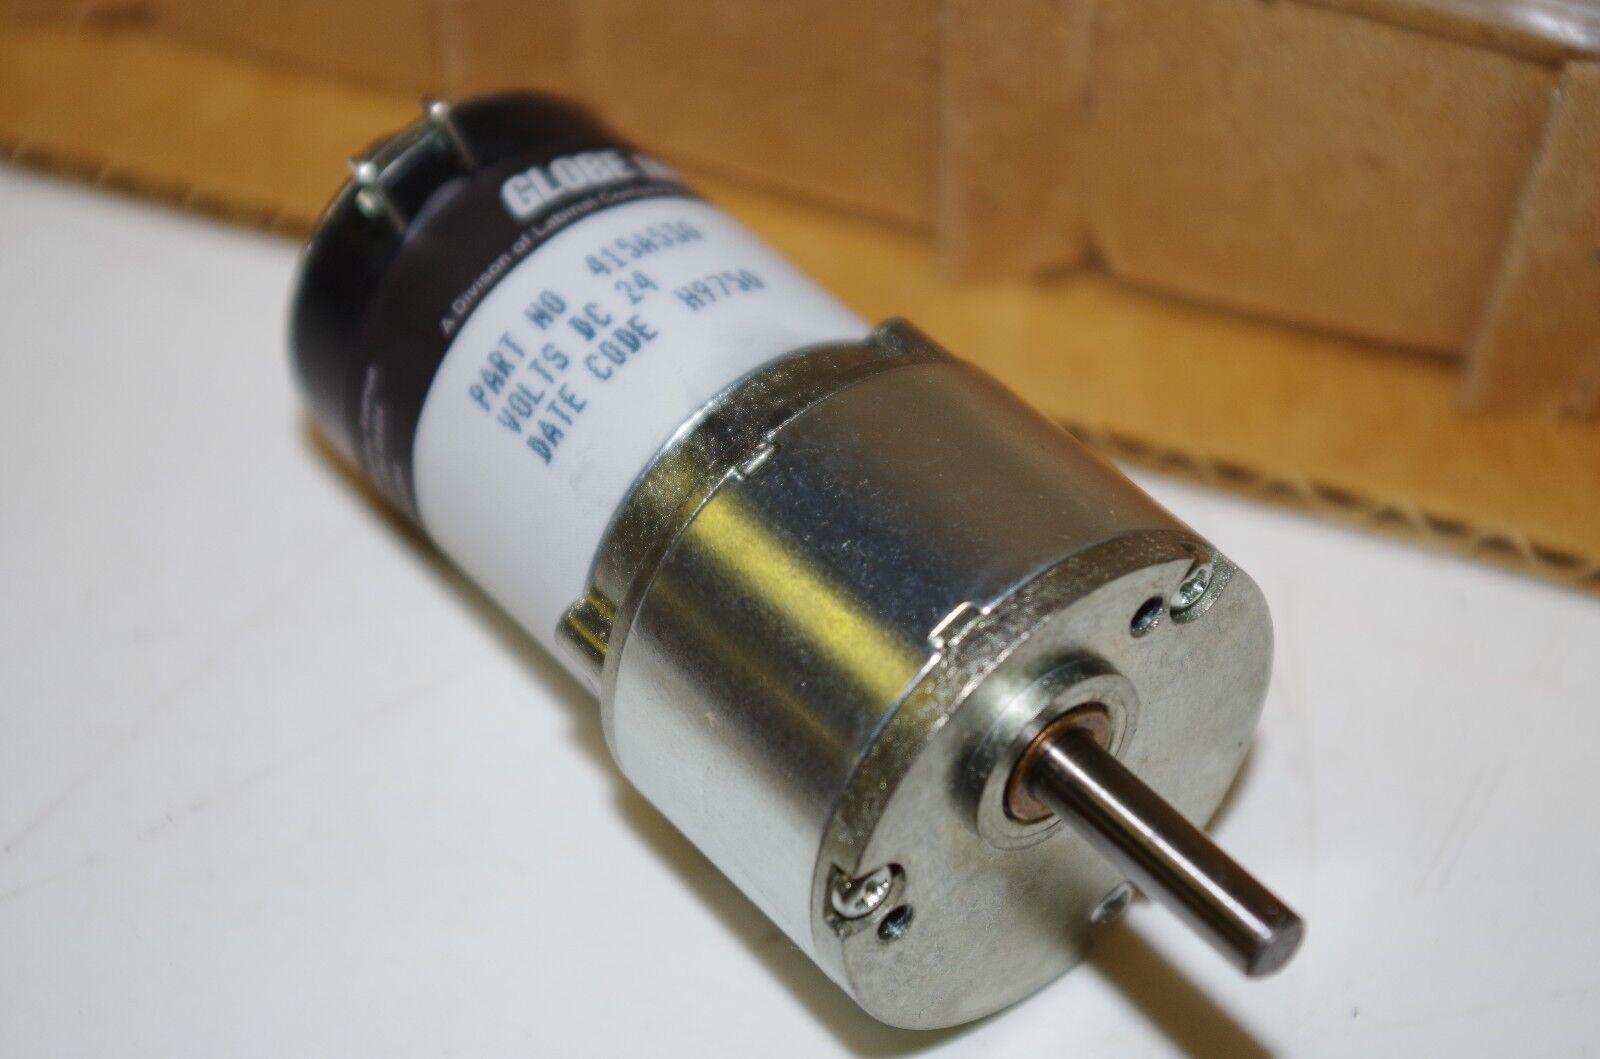 24 volt dc geared motor trw globe 415a530 motor gearhead for 24 volt servo motor